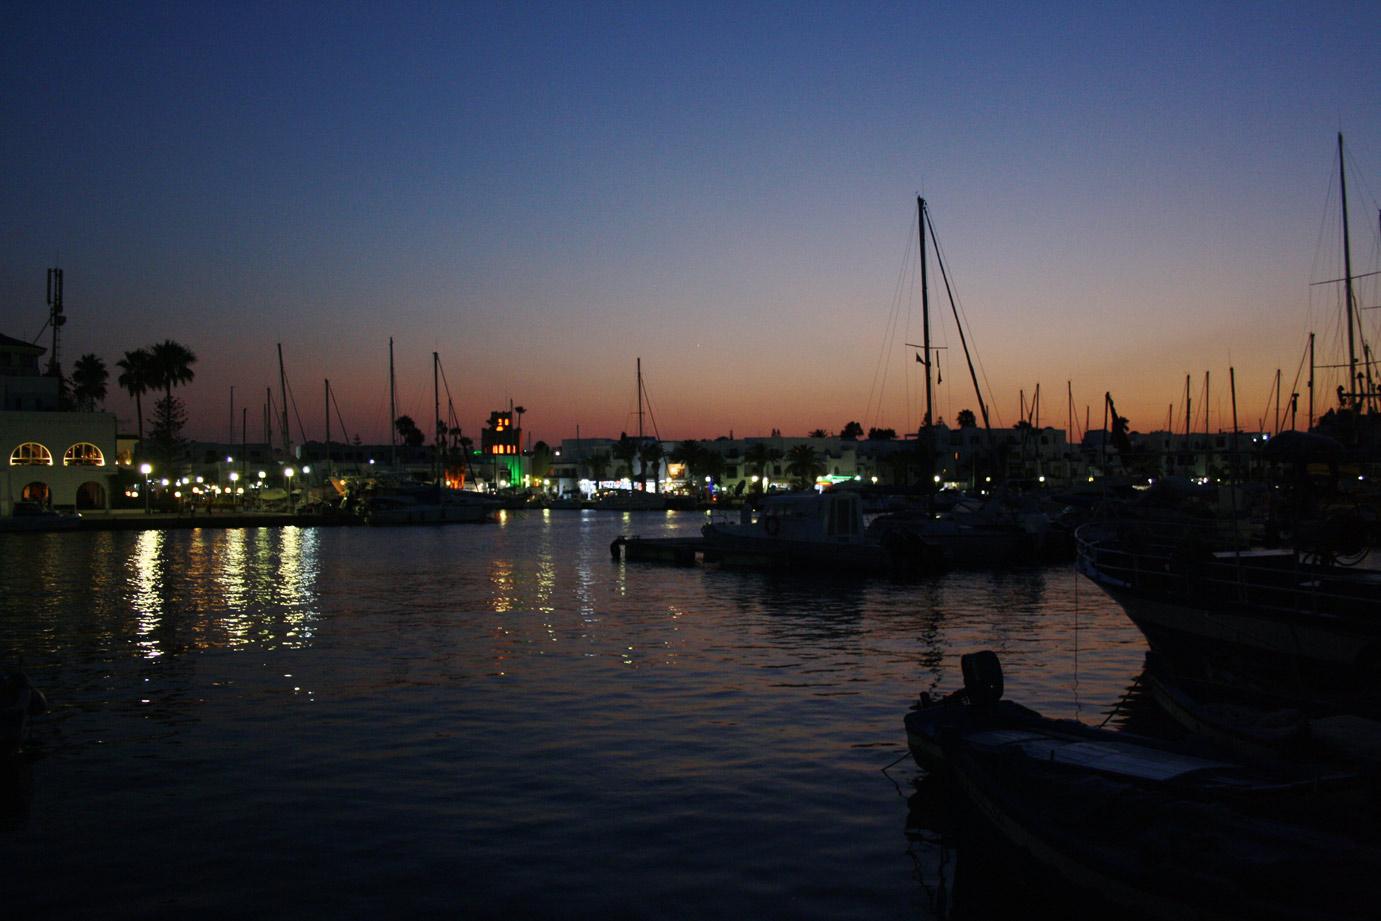 TUNISIA PHOTO DIARY III. 12